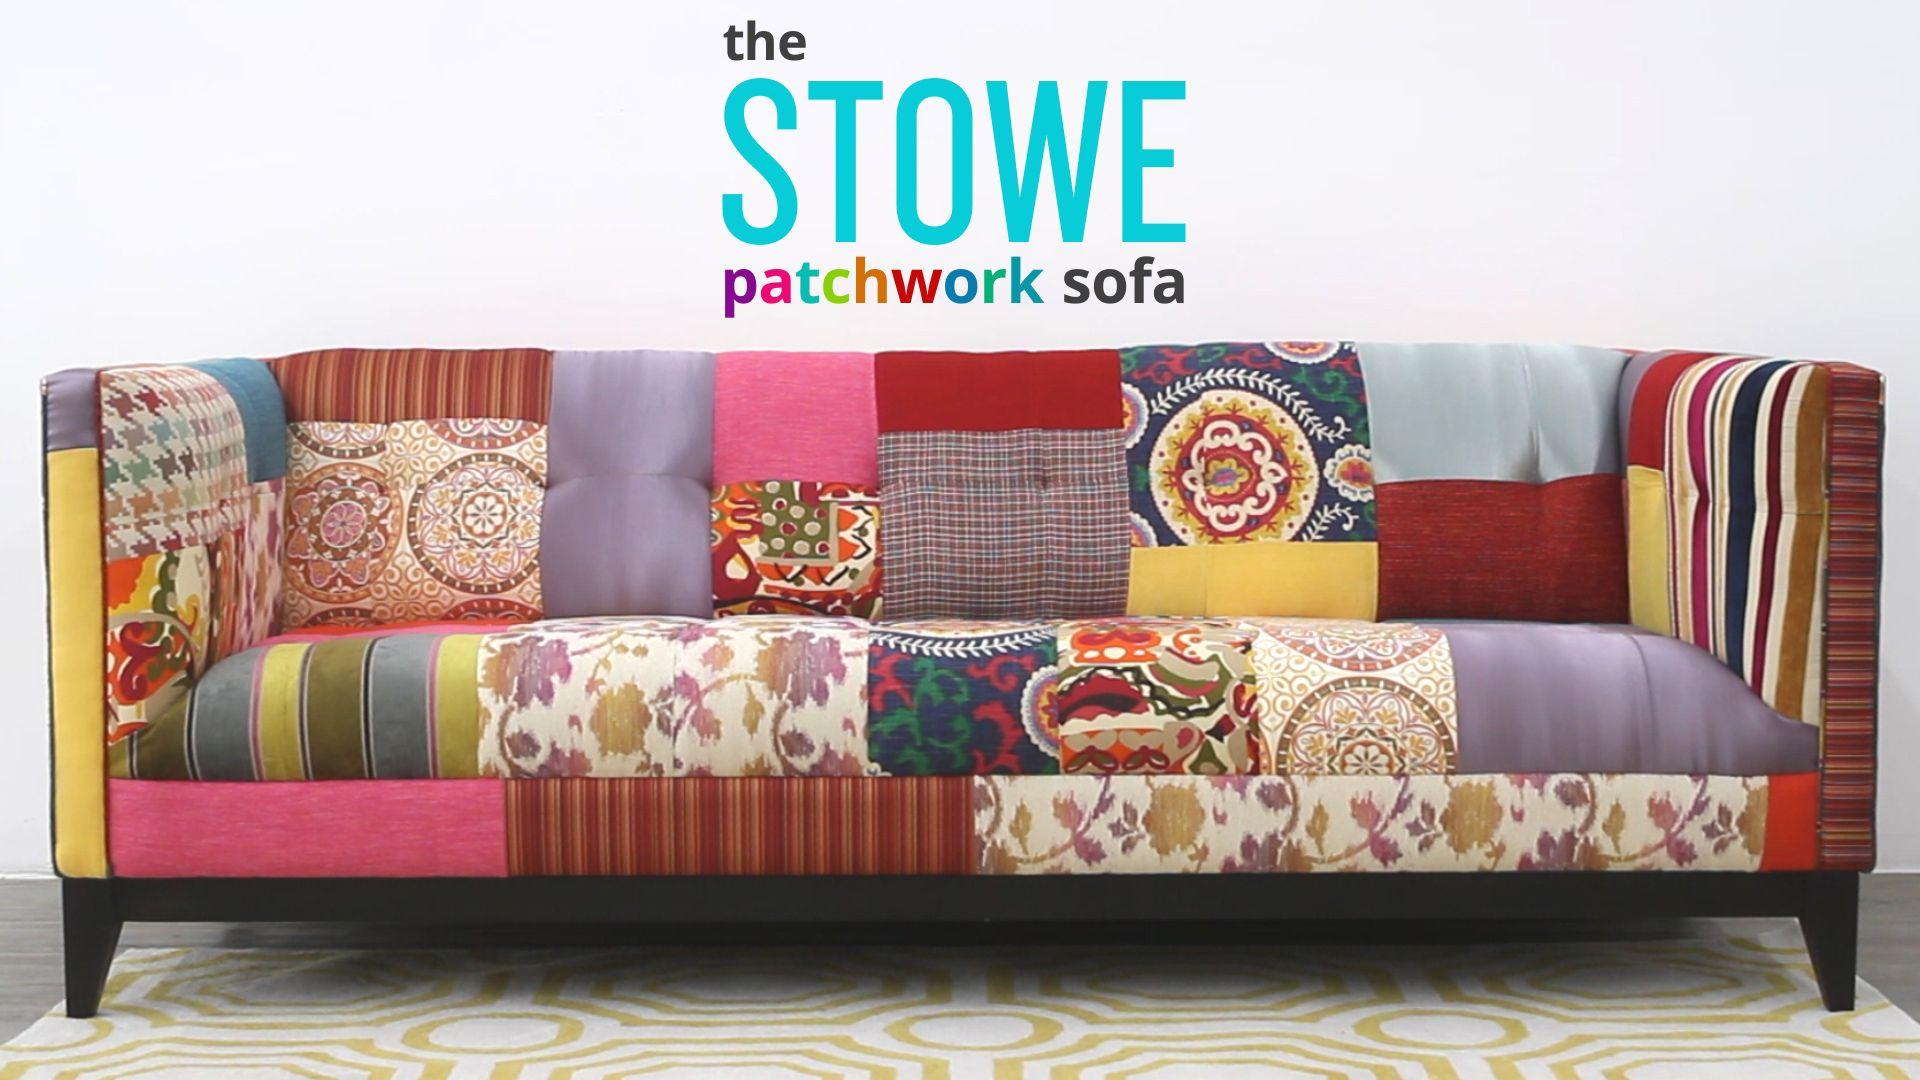 Stowe Patchwork Sofa By Joybird Furniture